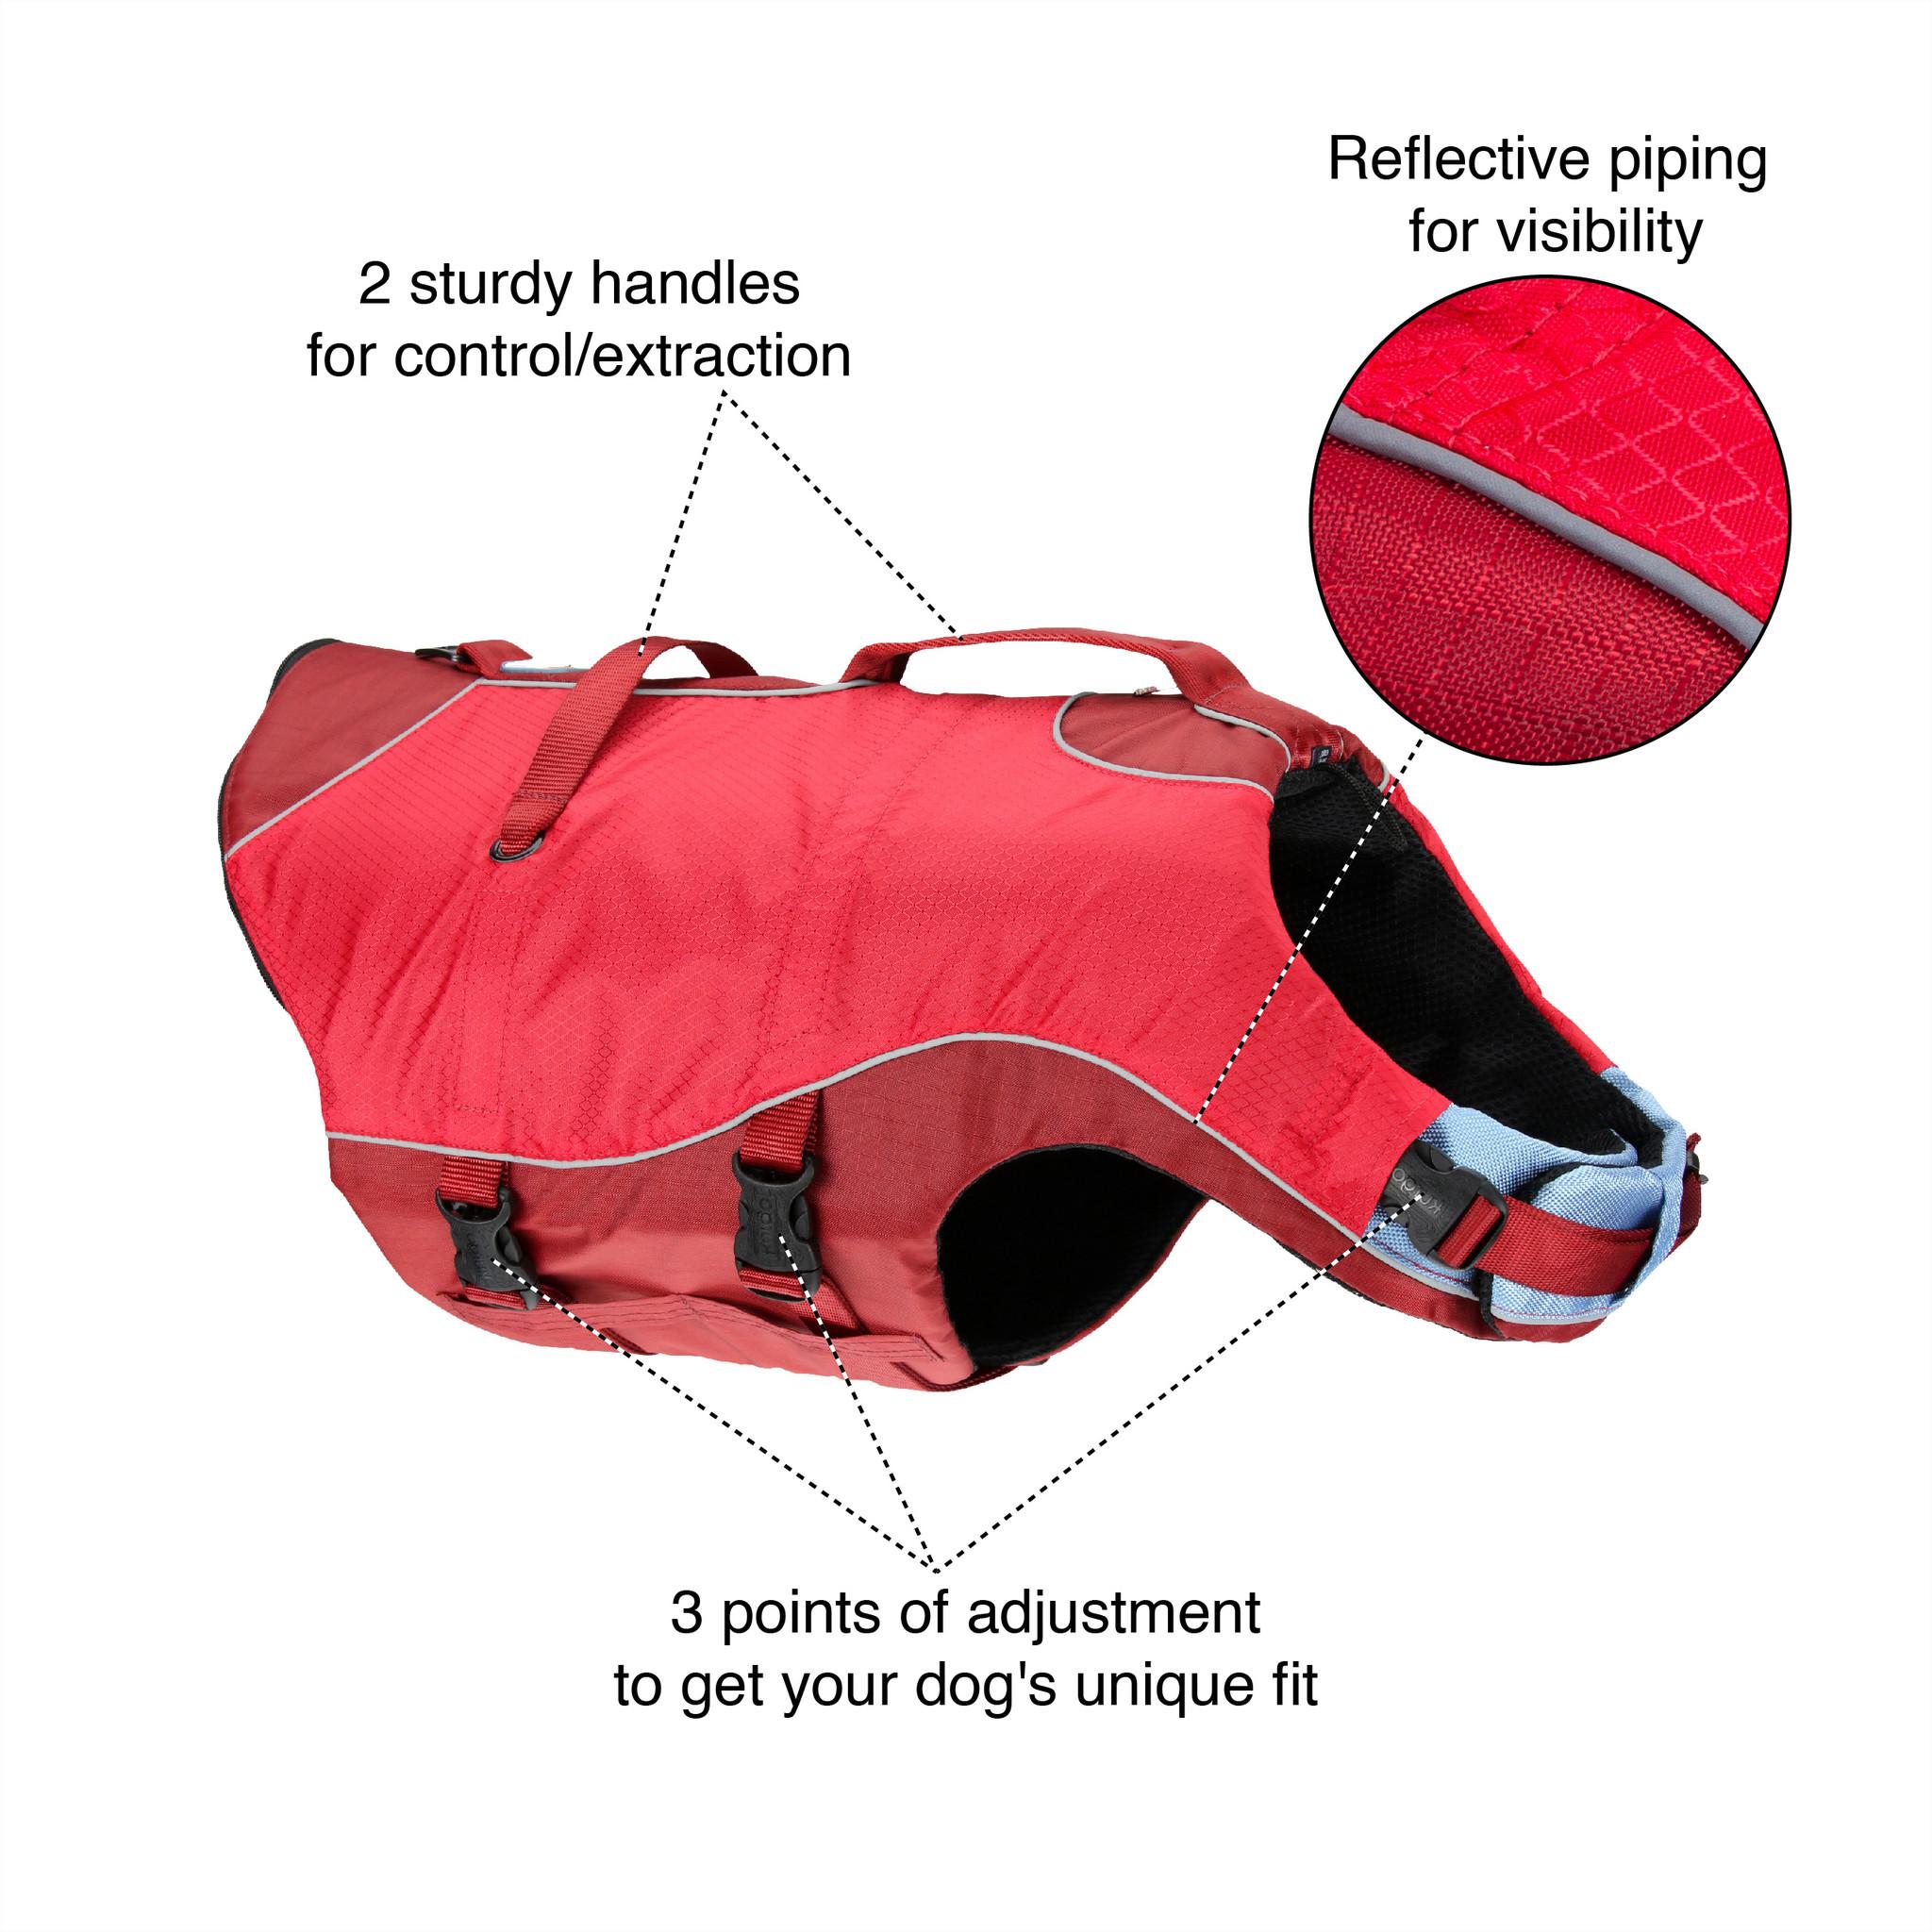 Kurgo Surf N Turf dog life jacket features